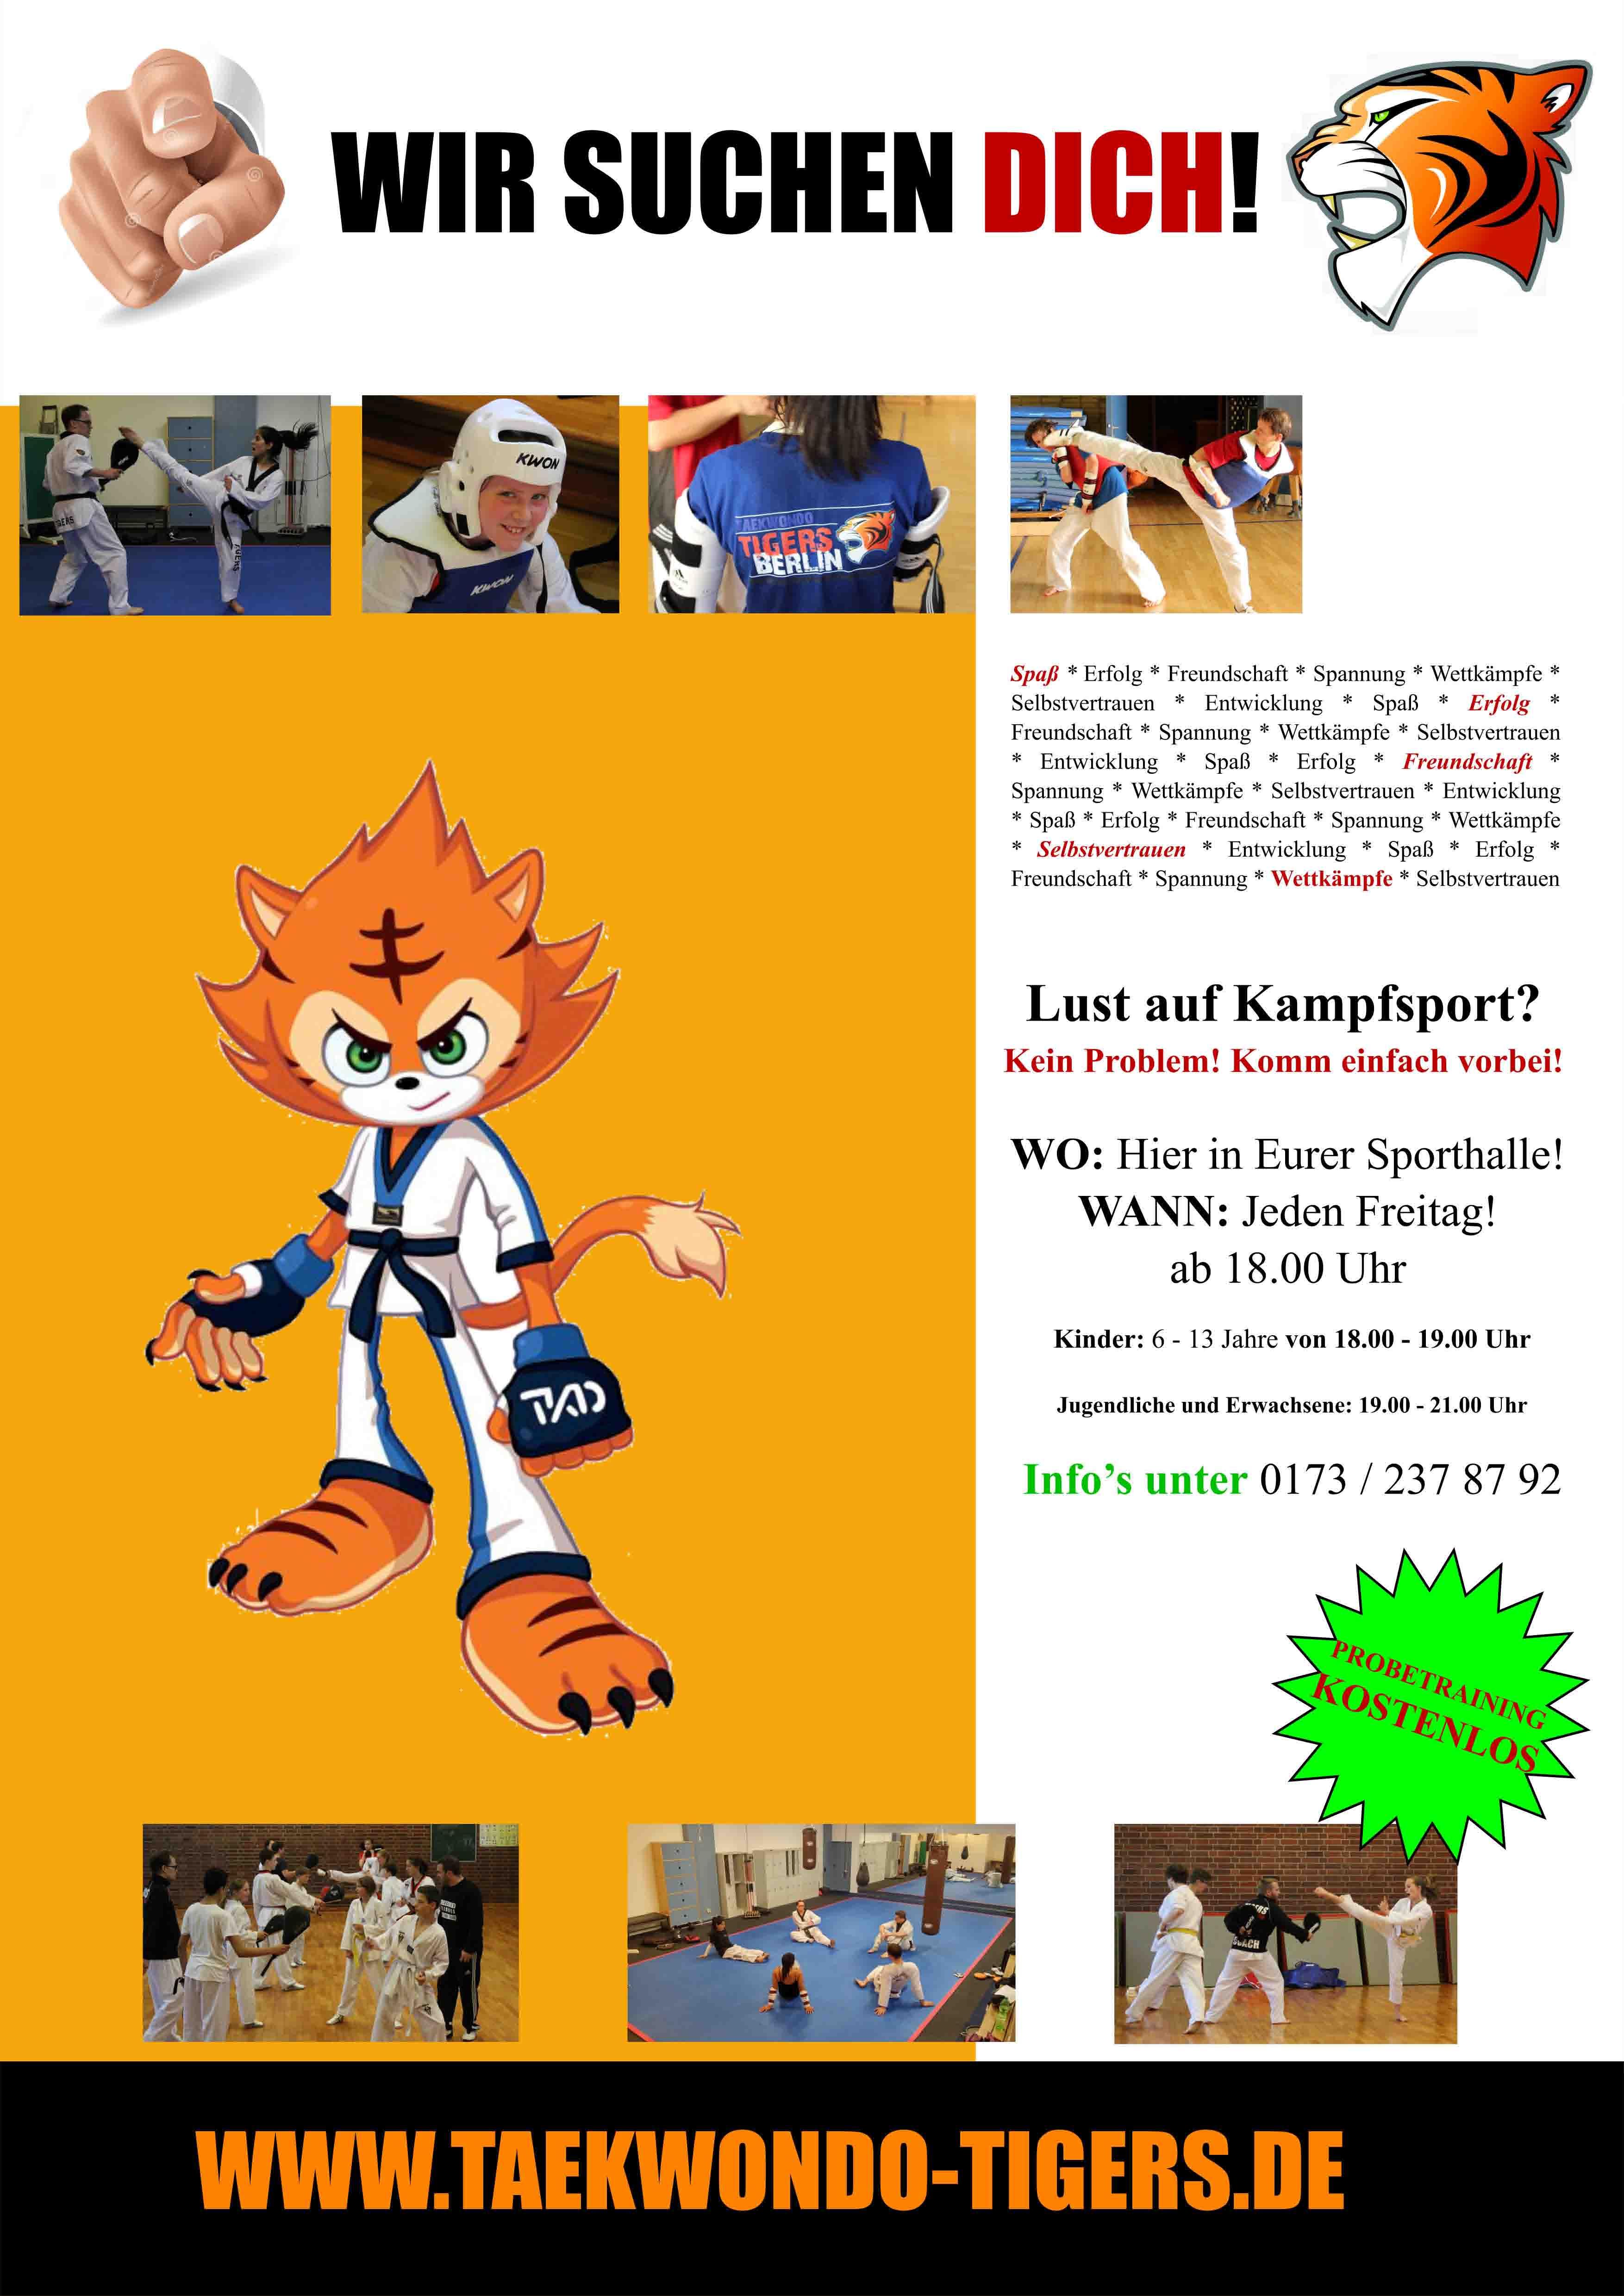 WIR SUCHEN DICH - Taekwondo Tigers Berlin Wedding Poster